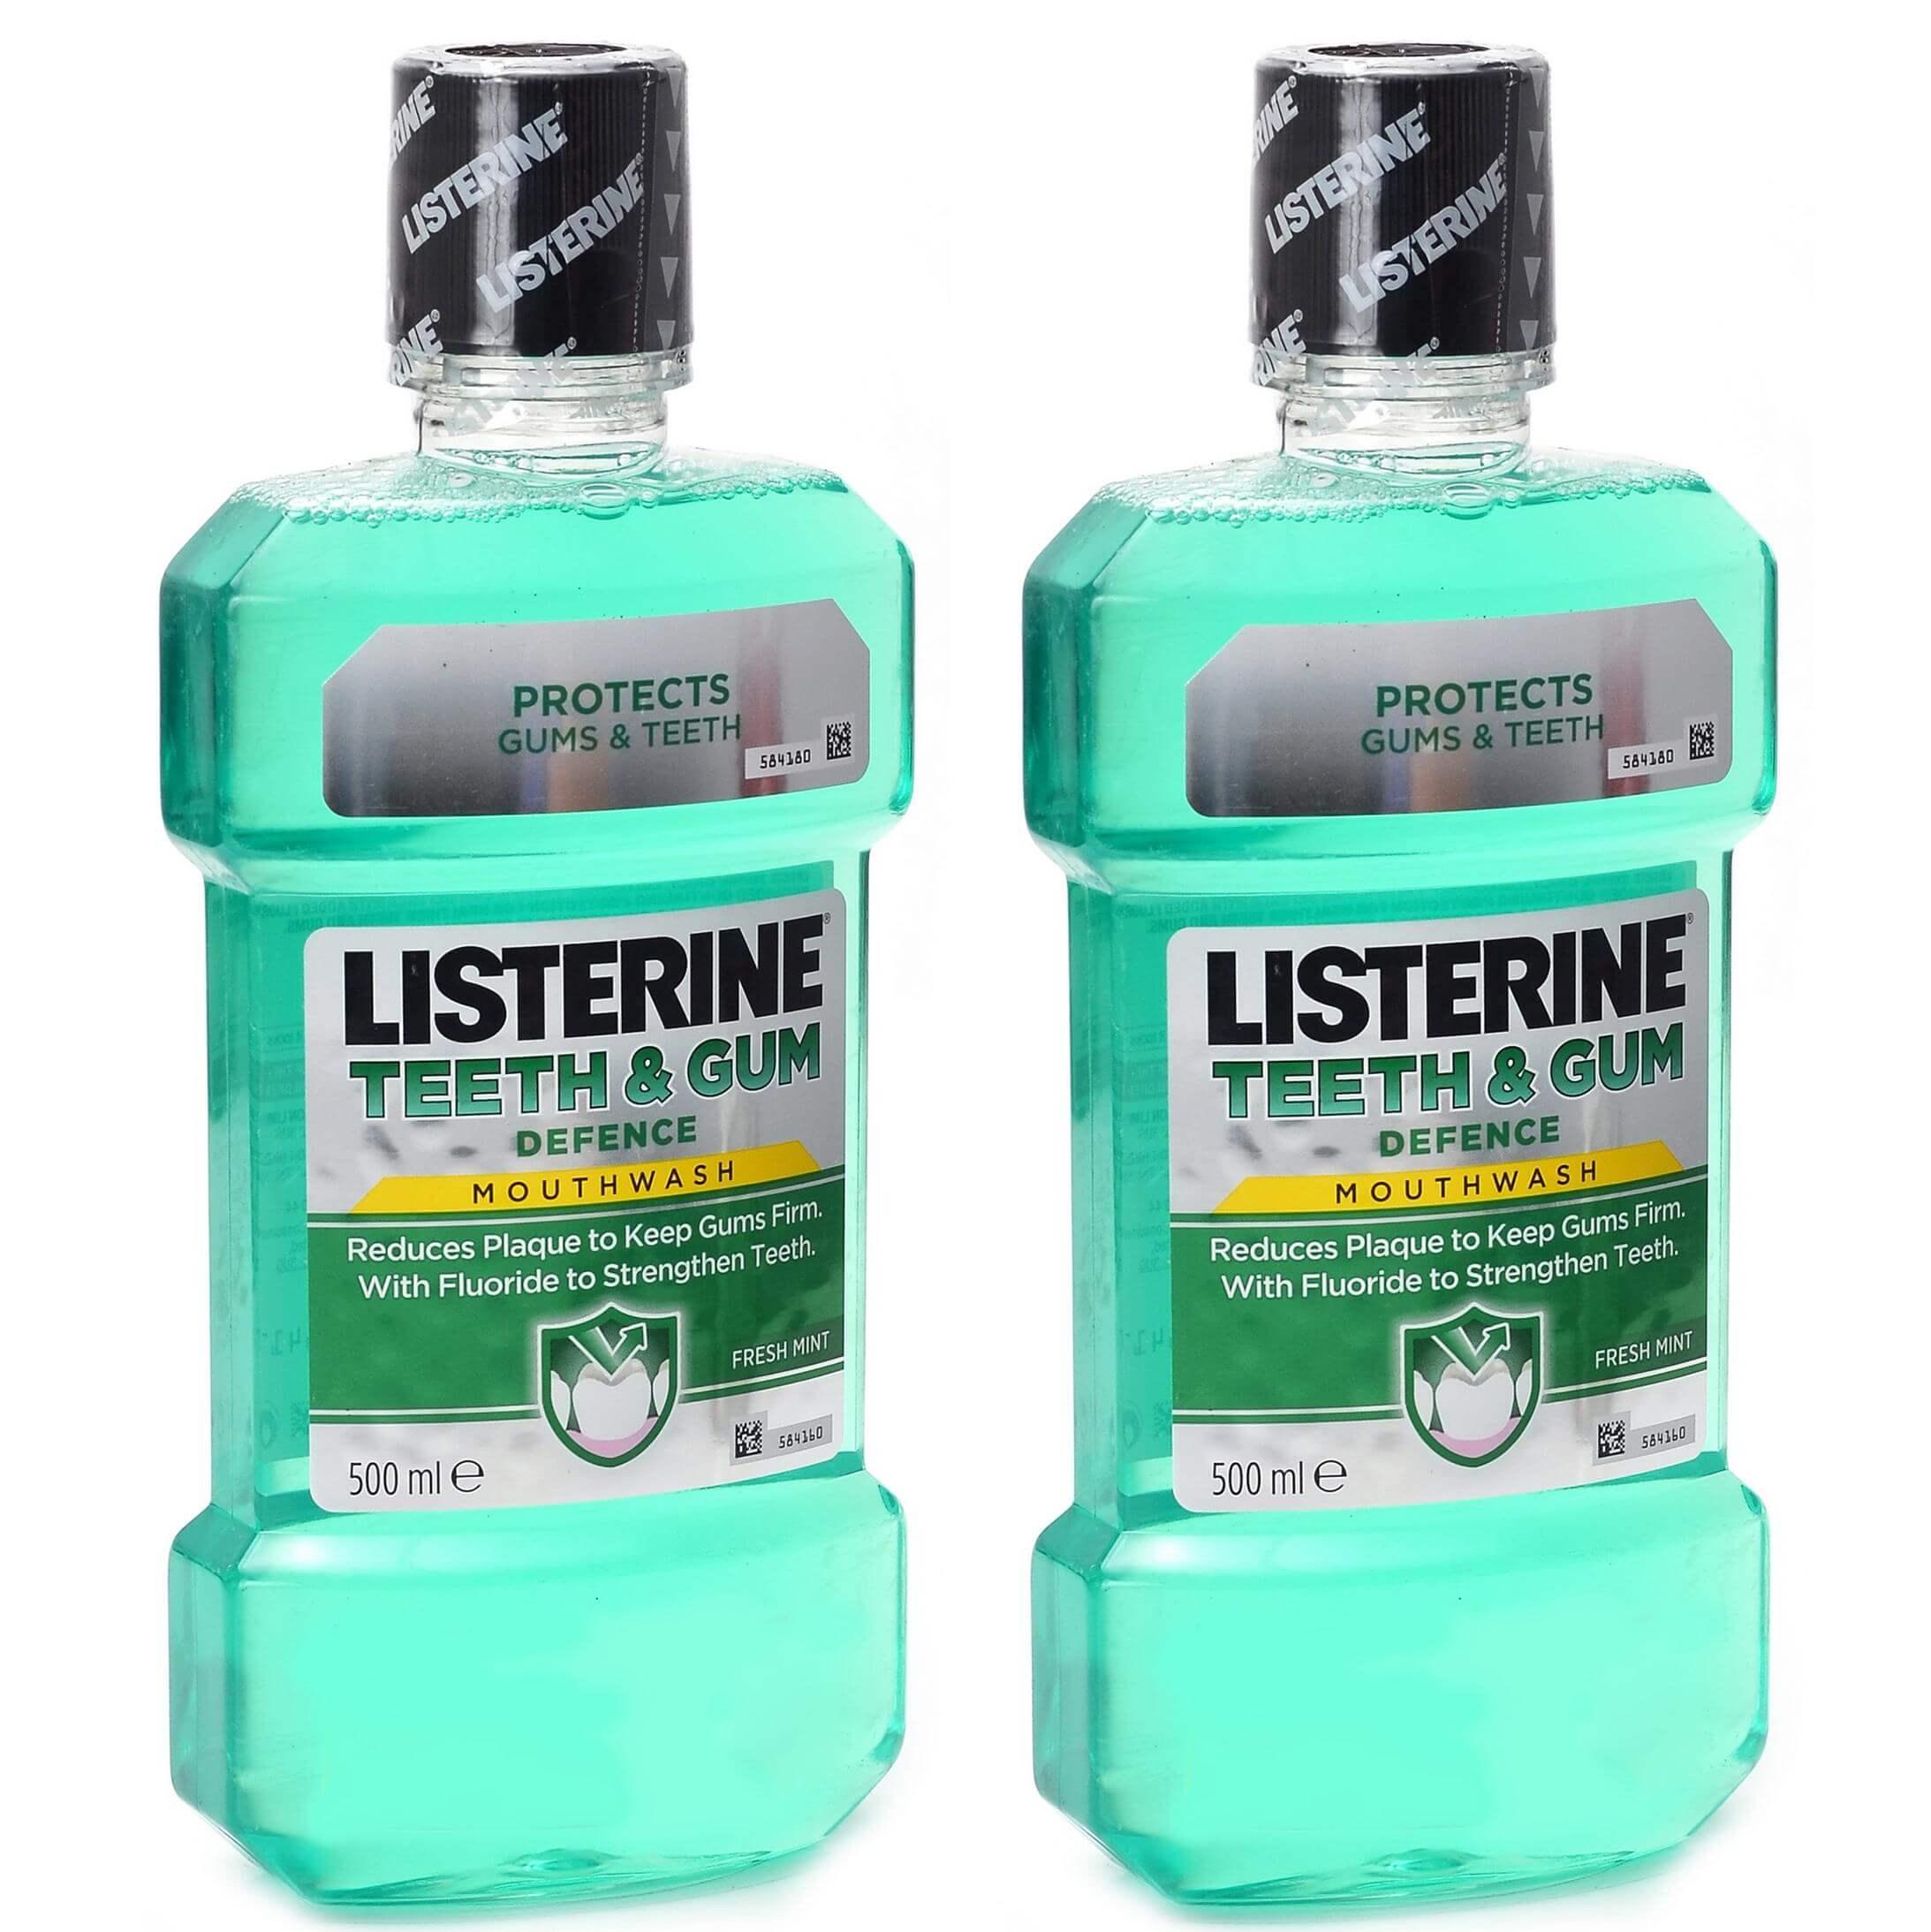 Listerine Πακέτο Προσφοράς Teeth & Gum Defence Ενδυναμώνει τα Δόντια &Προστατεύει τα Ούλα 2x500ml 1+1 Δώρο